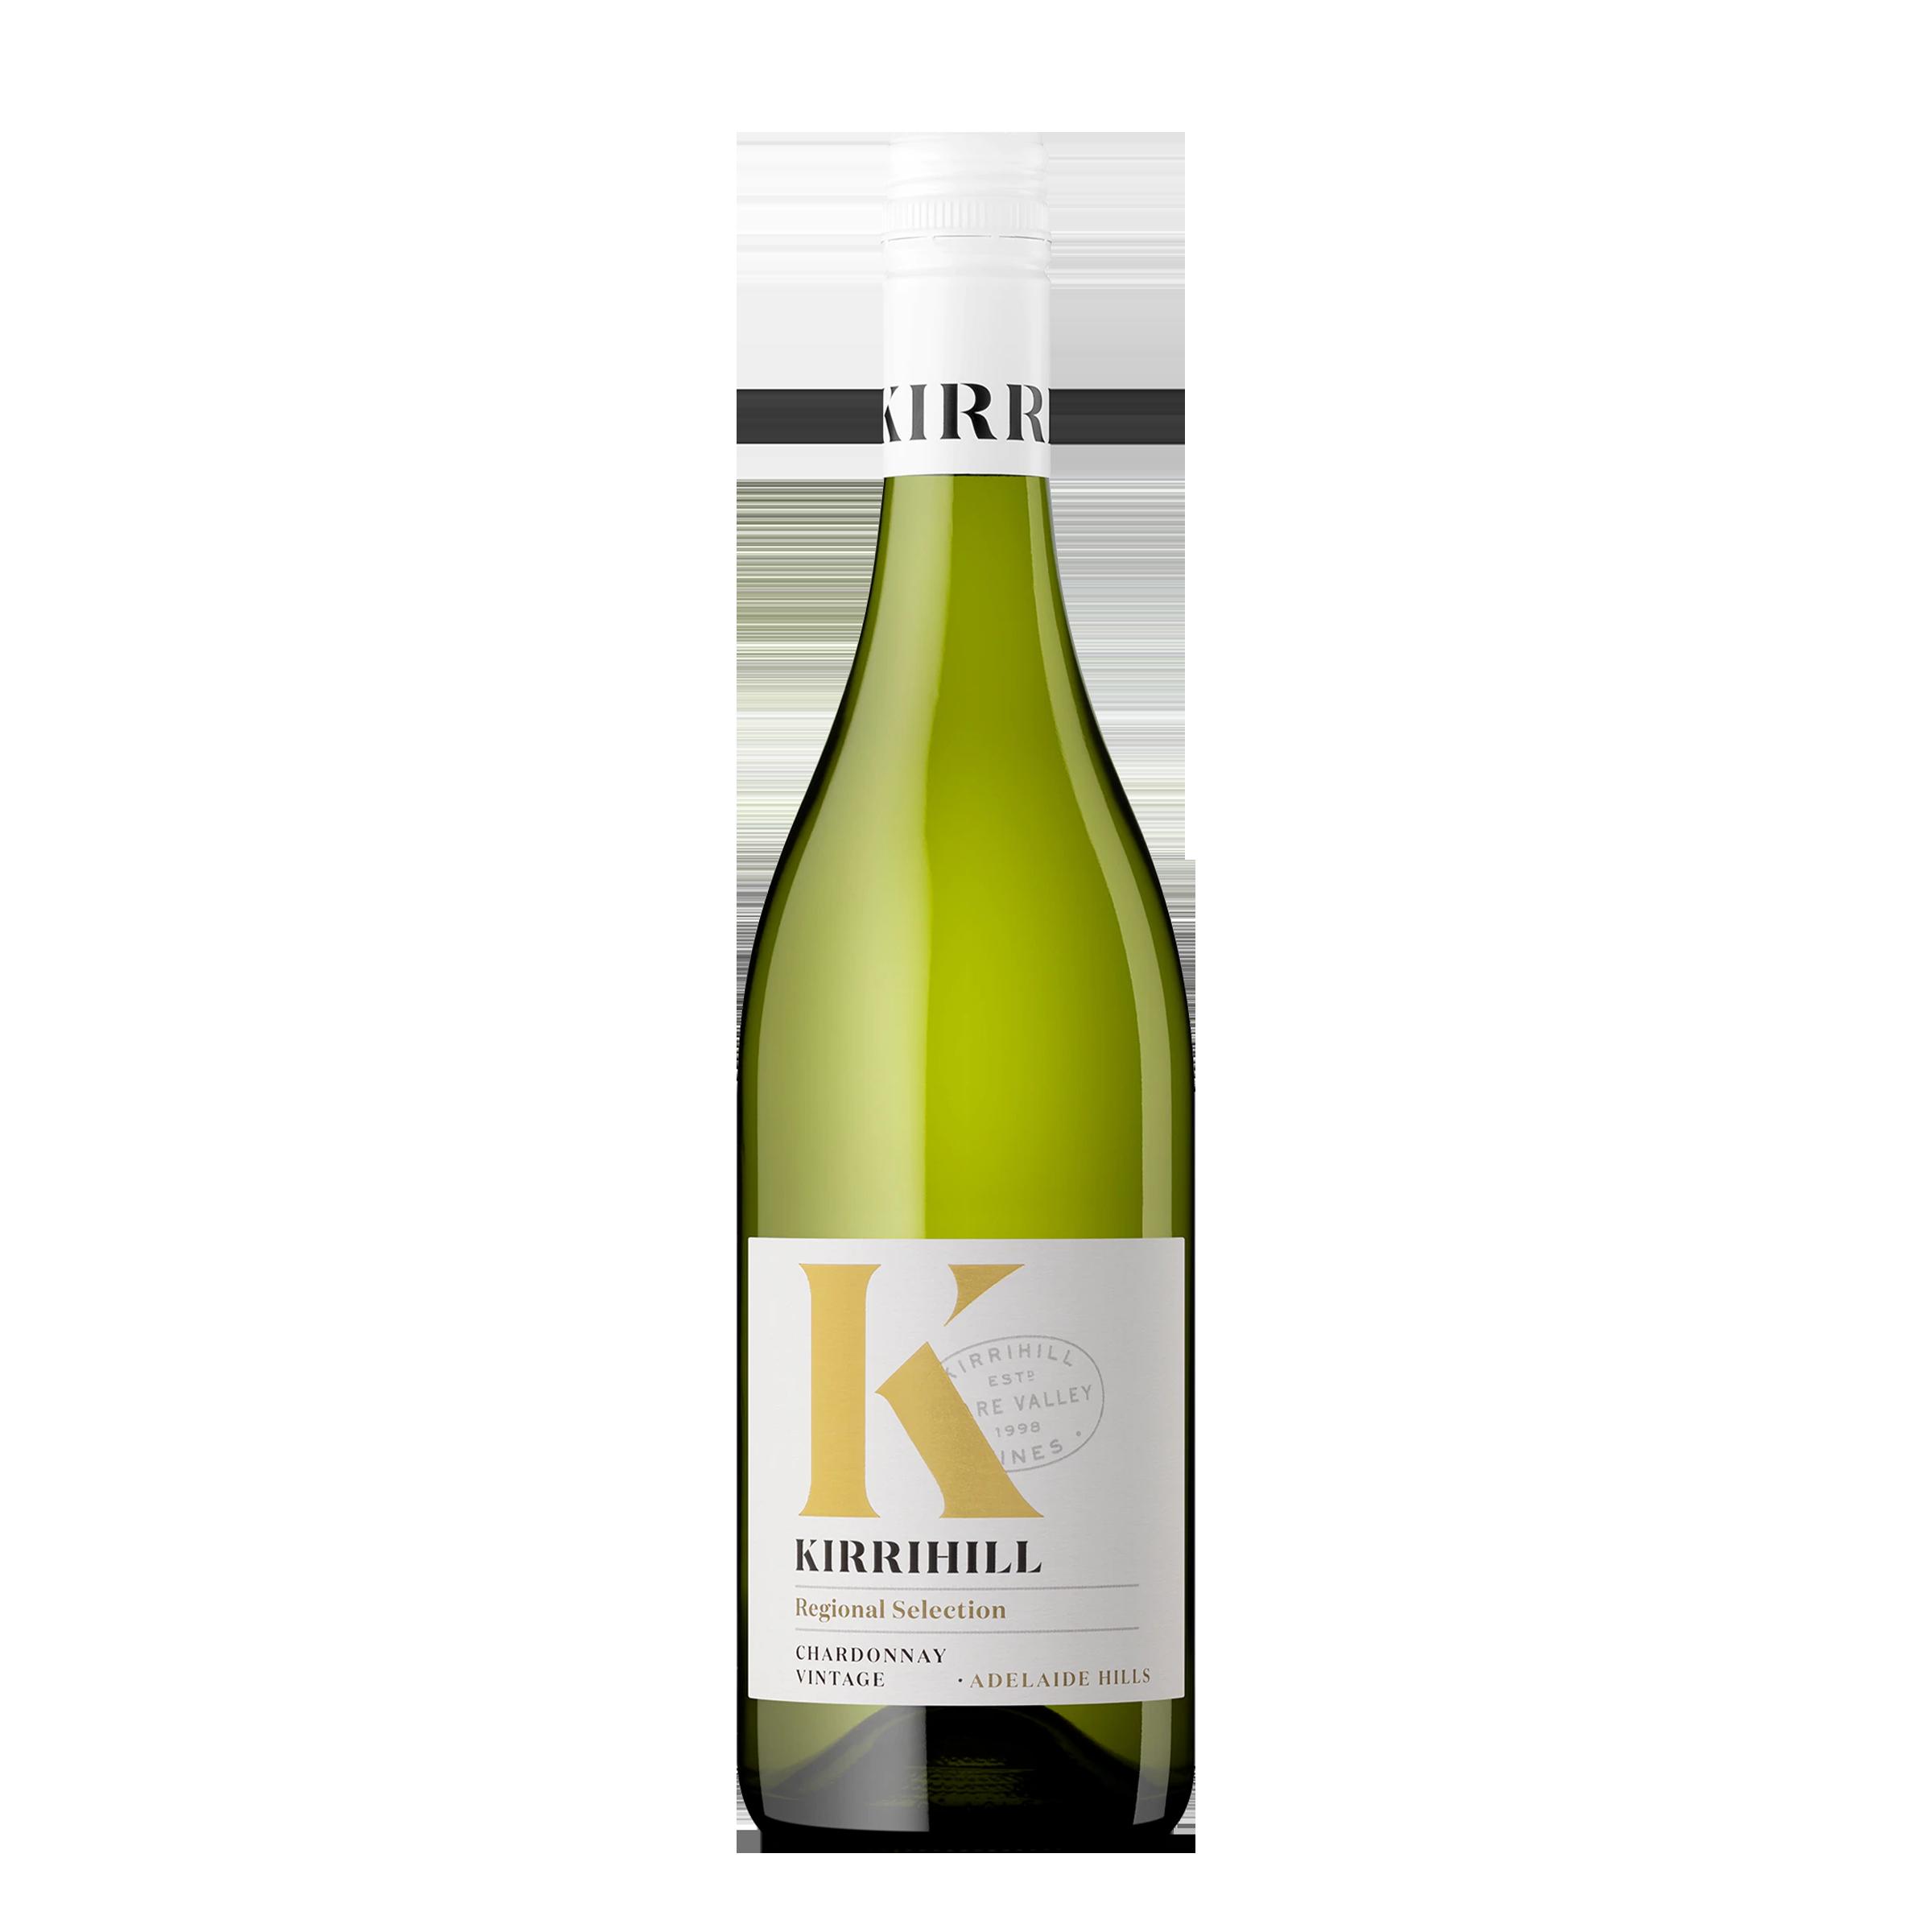 Kirrihill Regional Selection Chardonnay 750ml 2017